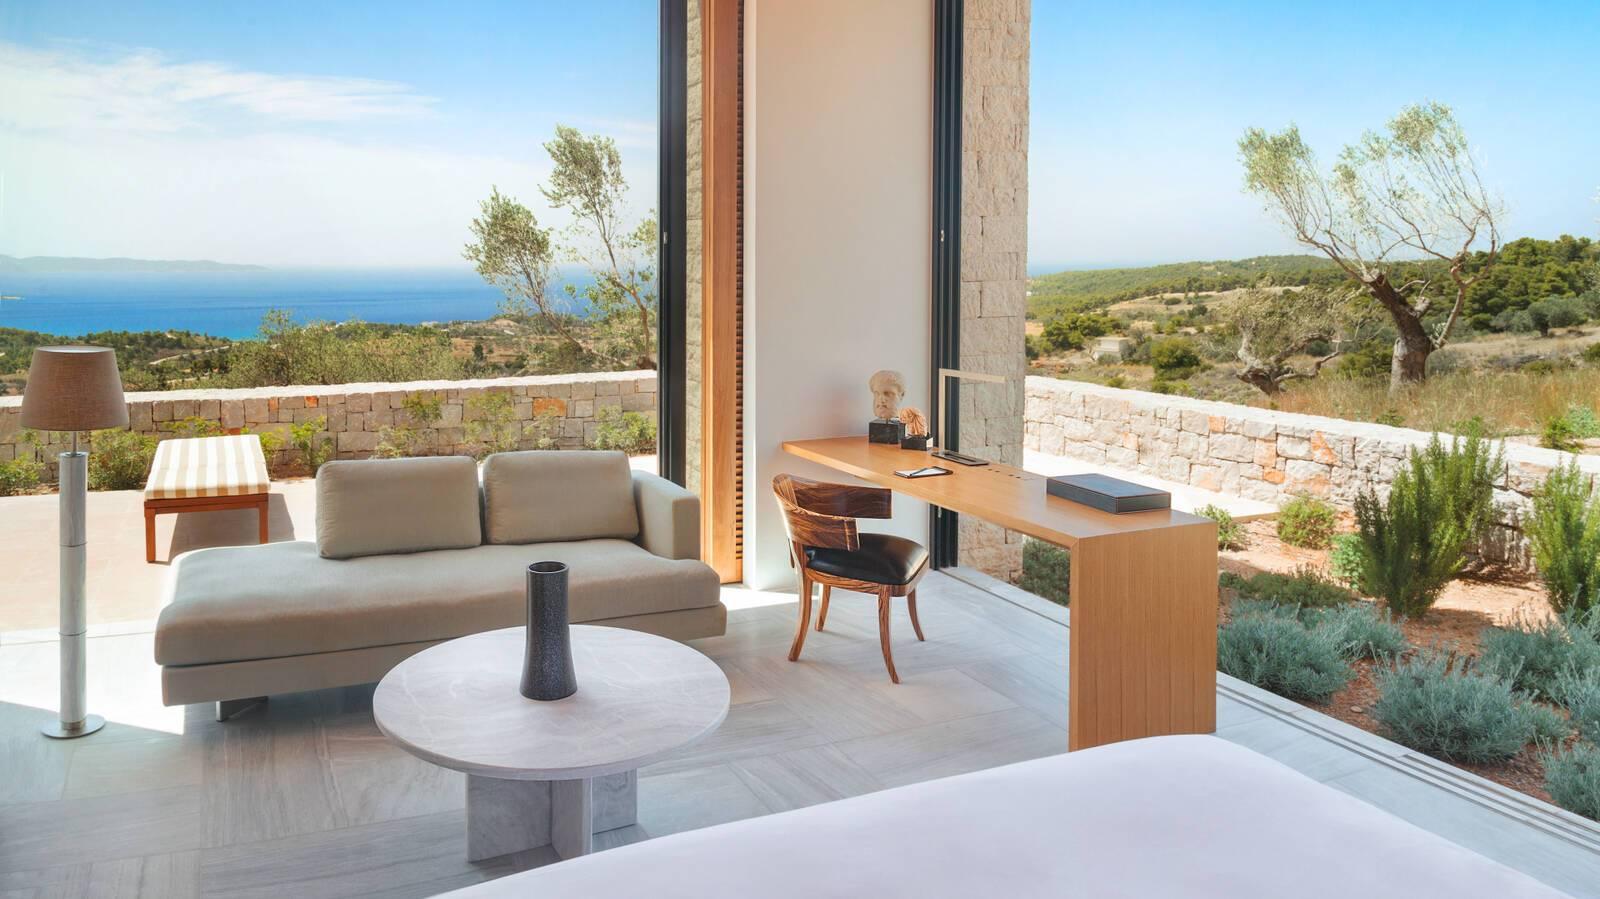 Amanzoe 5 Bedrooms Villa Chambre Grece Peloponnese